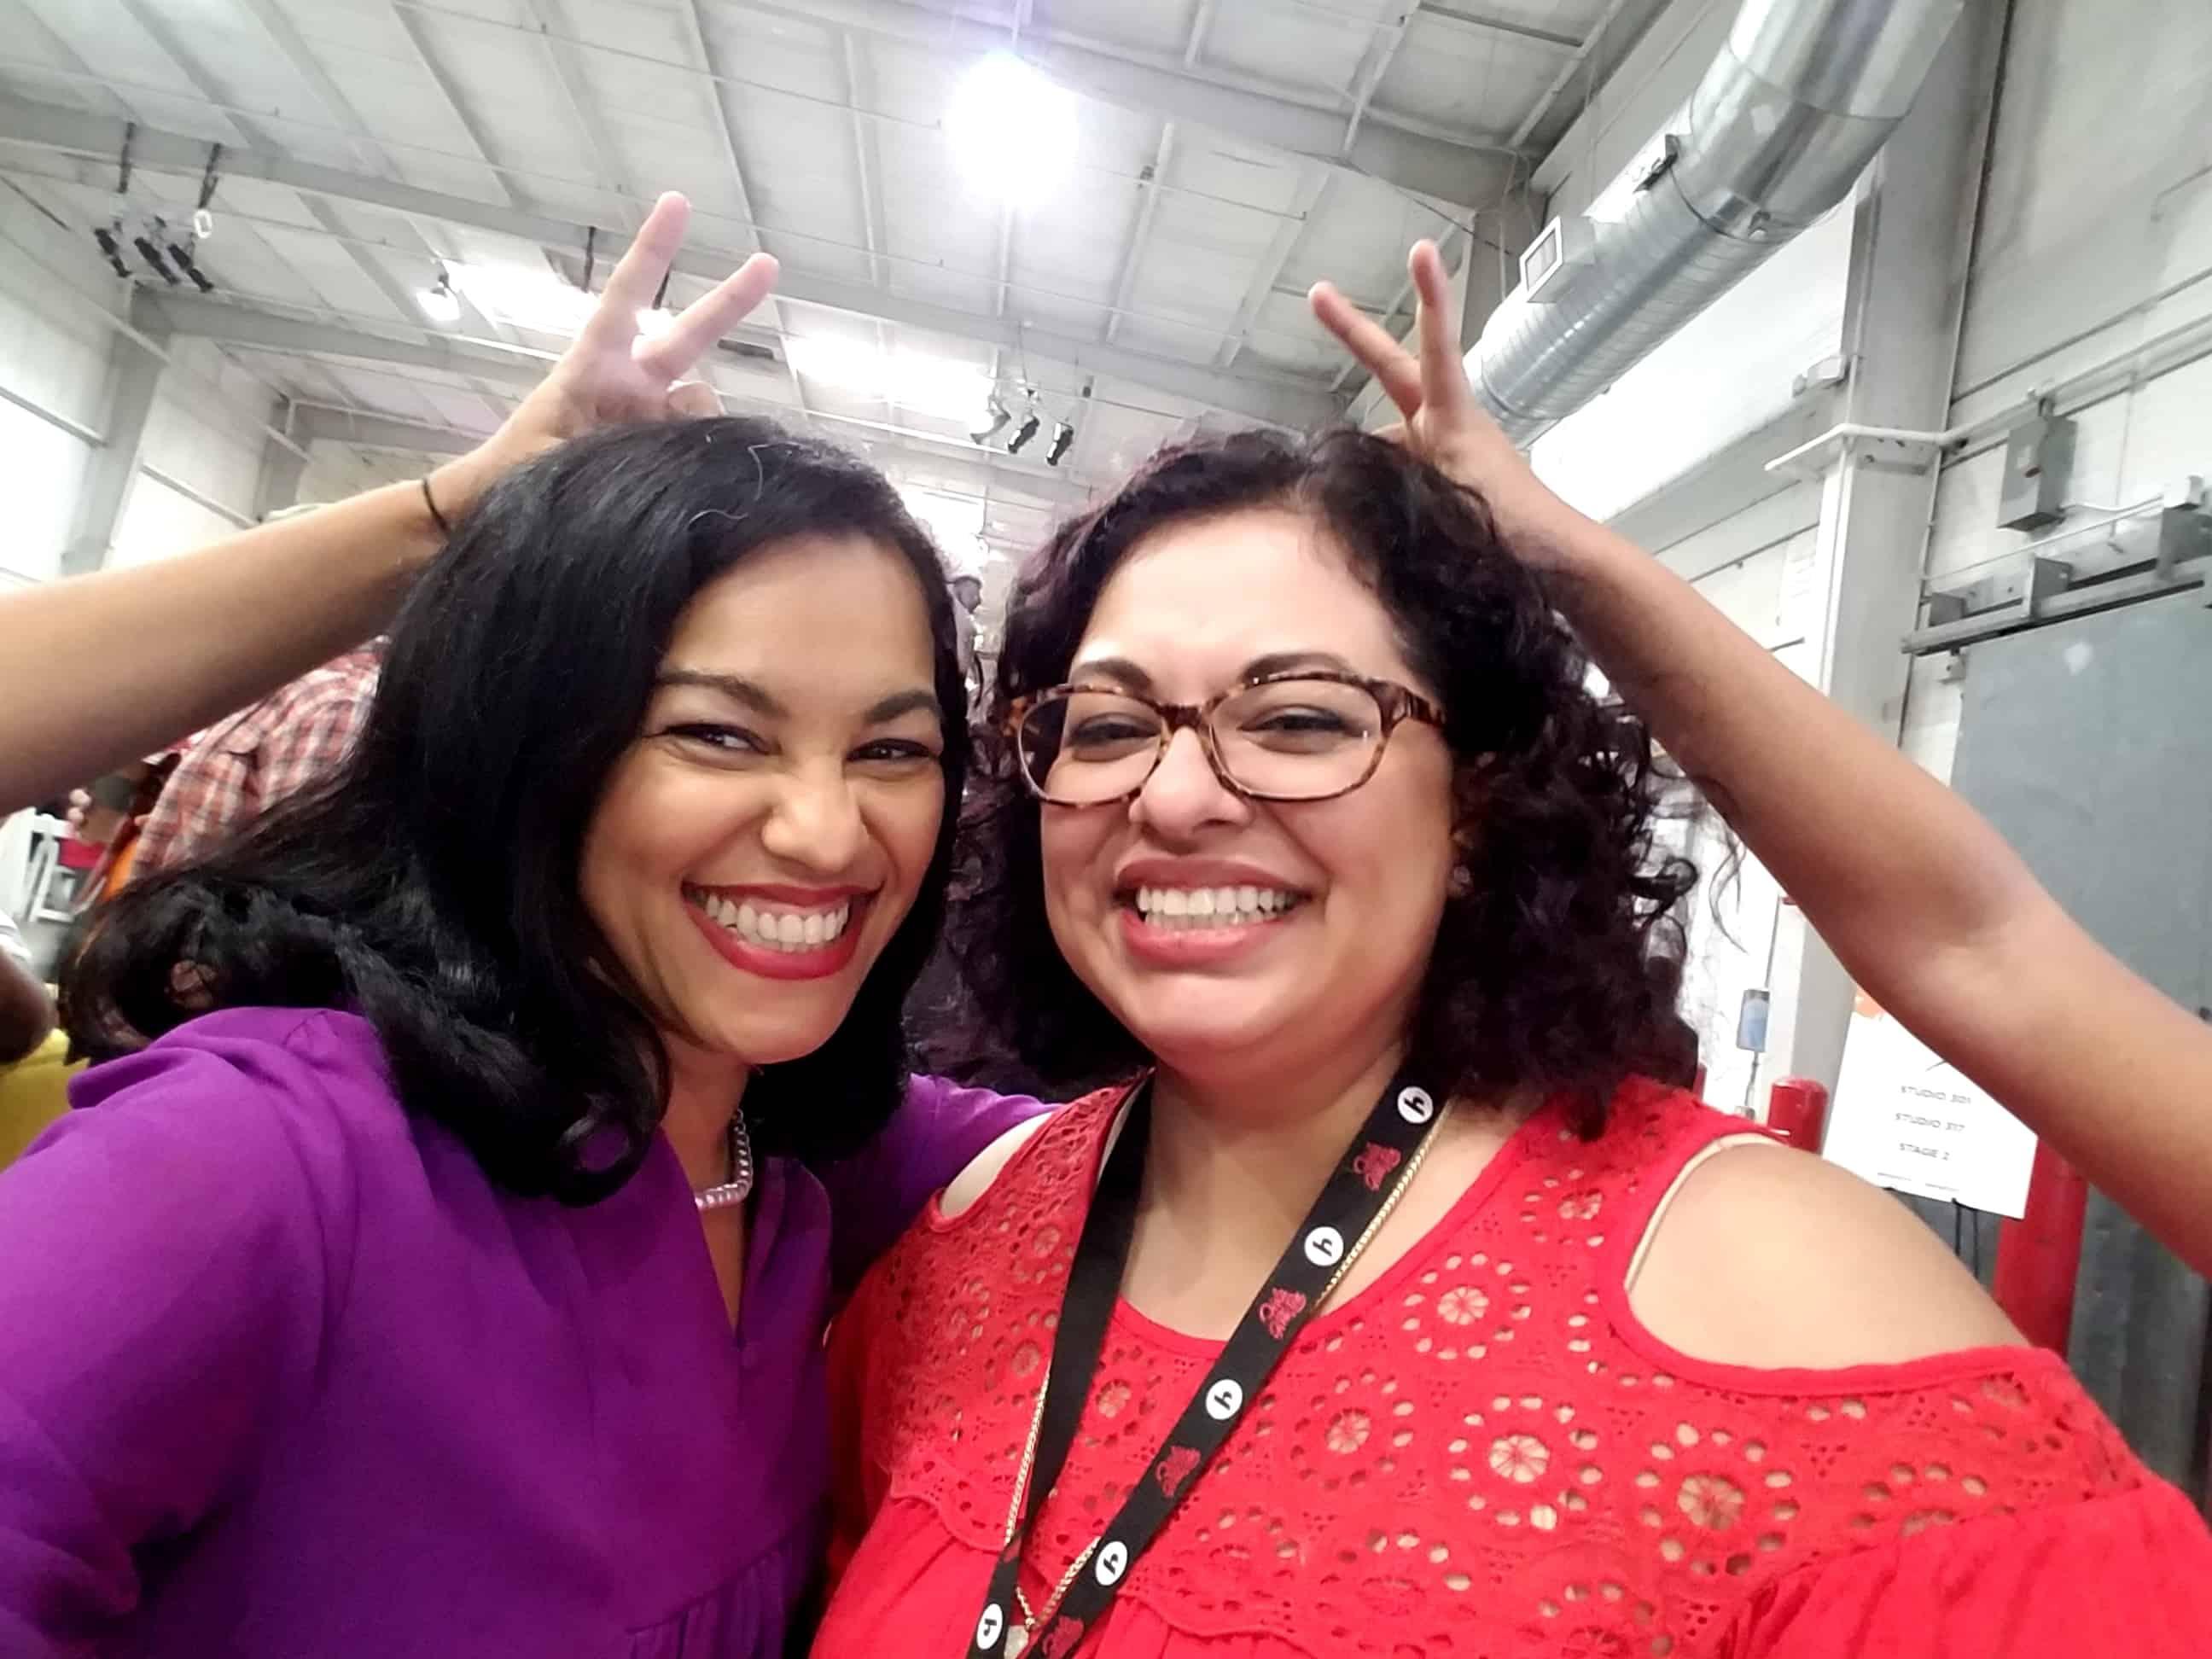 The Positive Mom and Candy Po - Hispanicize Texas